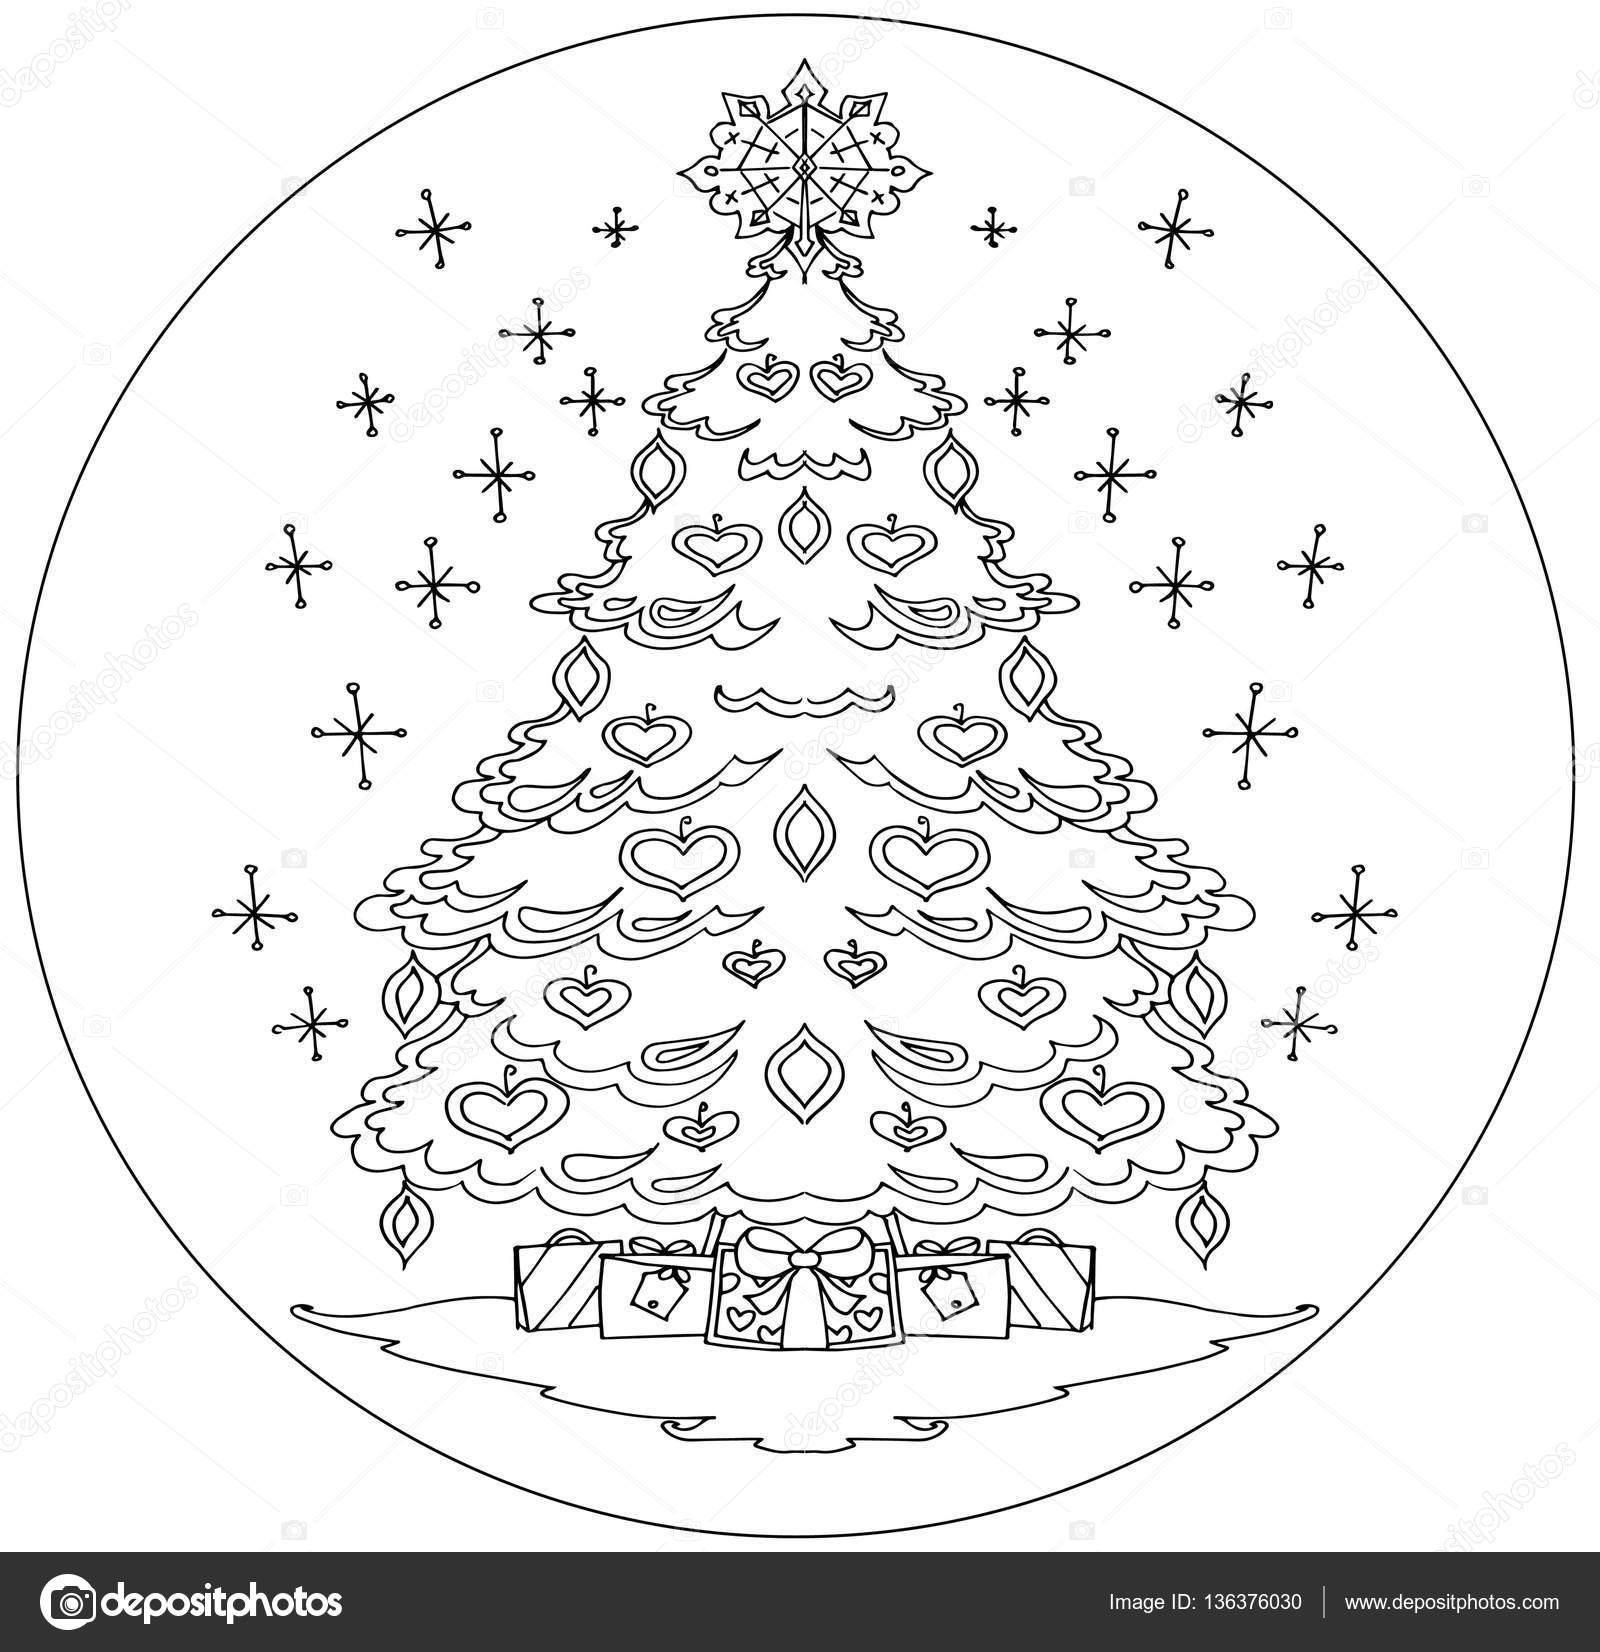 Mandala arbol de navidad | Mandala para colorear de árbol de